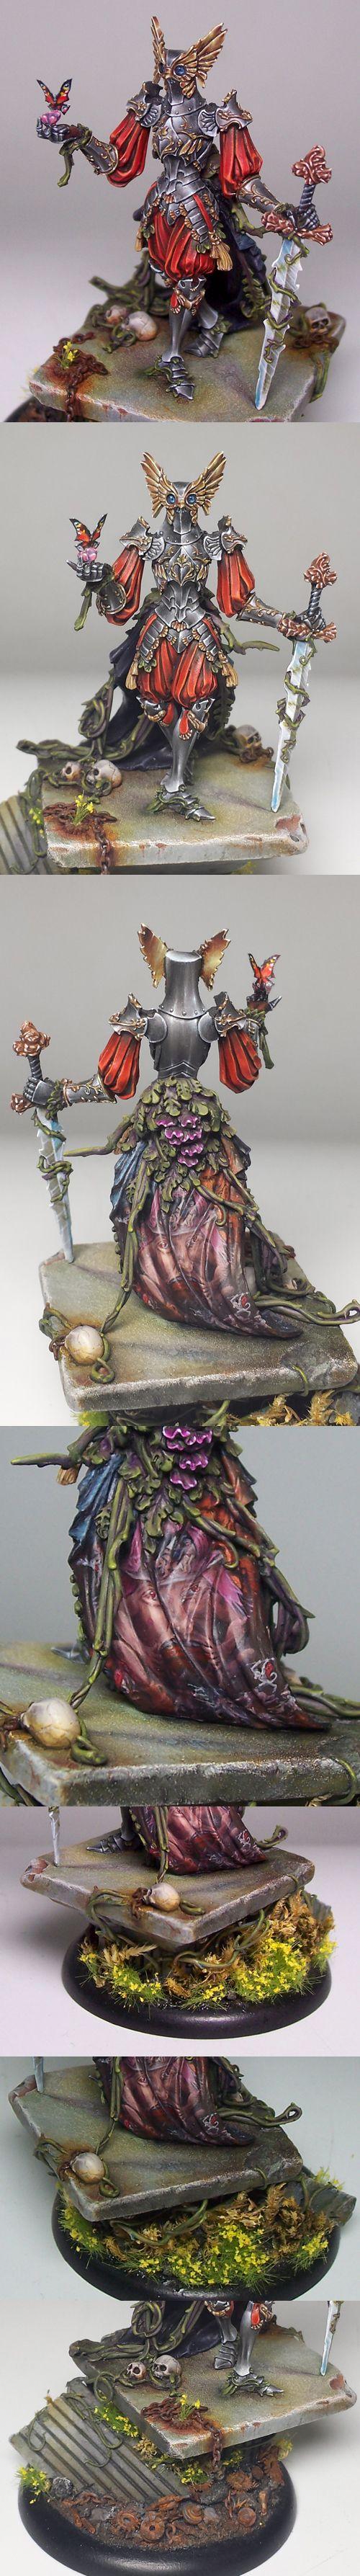 Kingdom Death - Flower Knight close ups by Tommie Soule